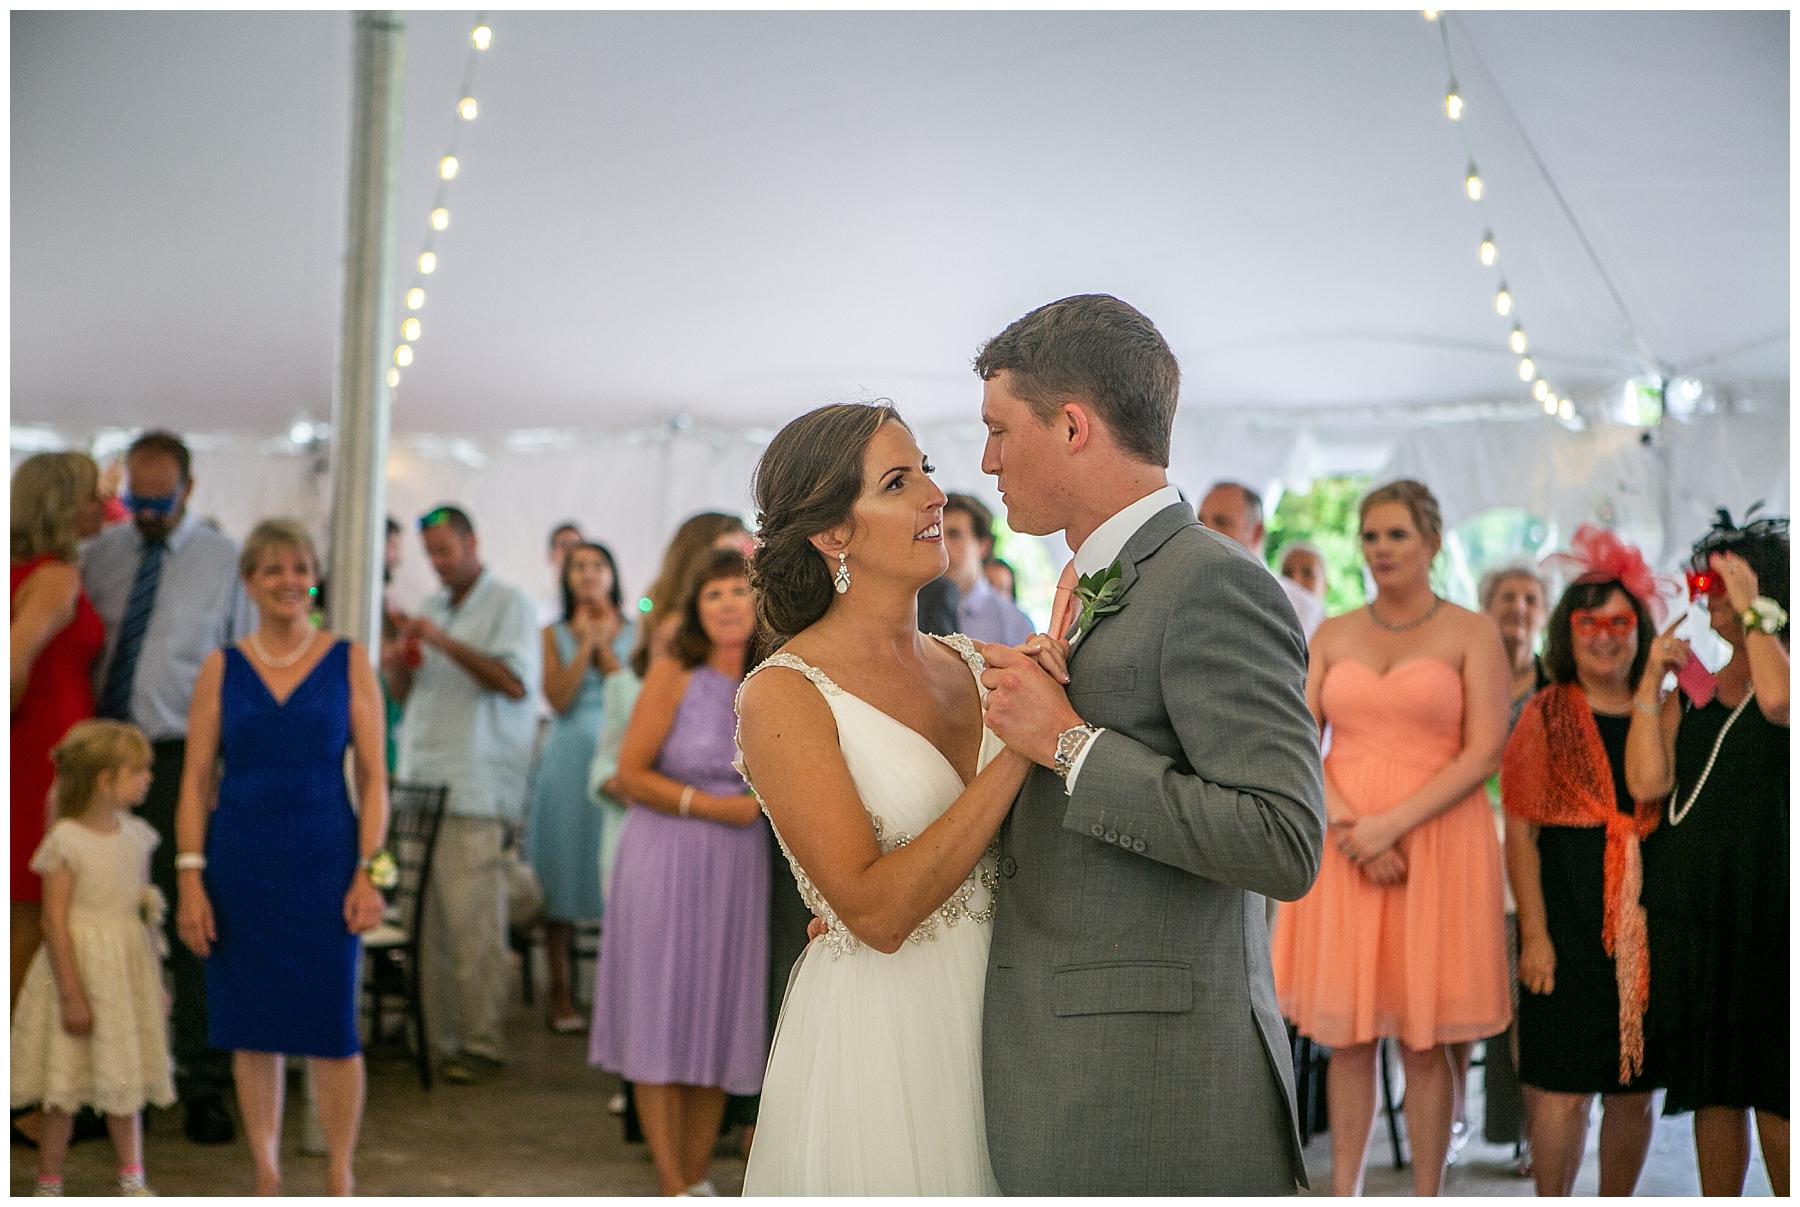 Chelsea Phil Bohemia River Overlook Wedding Living Radiant Photography photos_0134.jpg